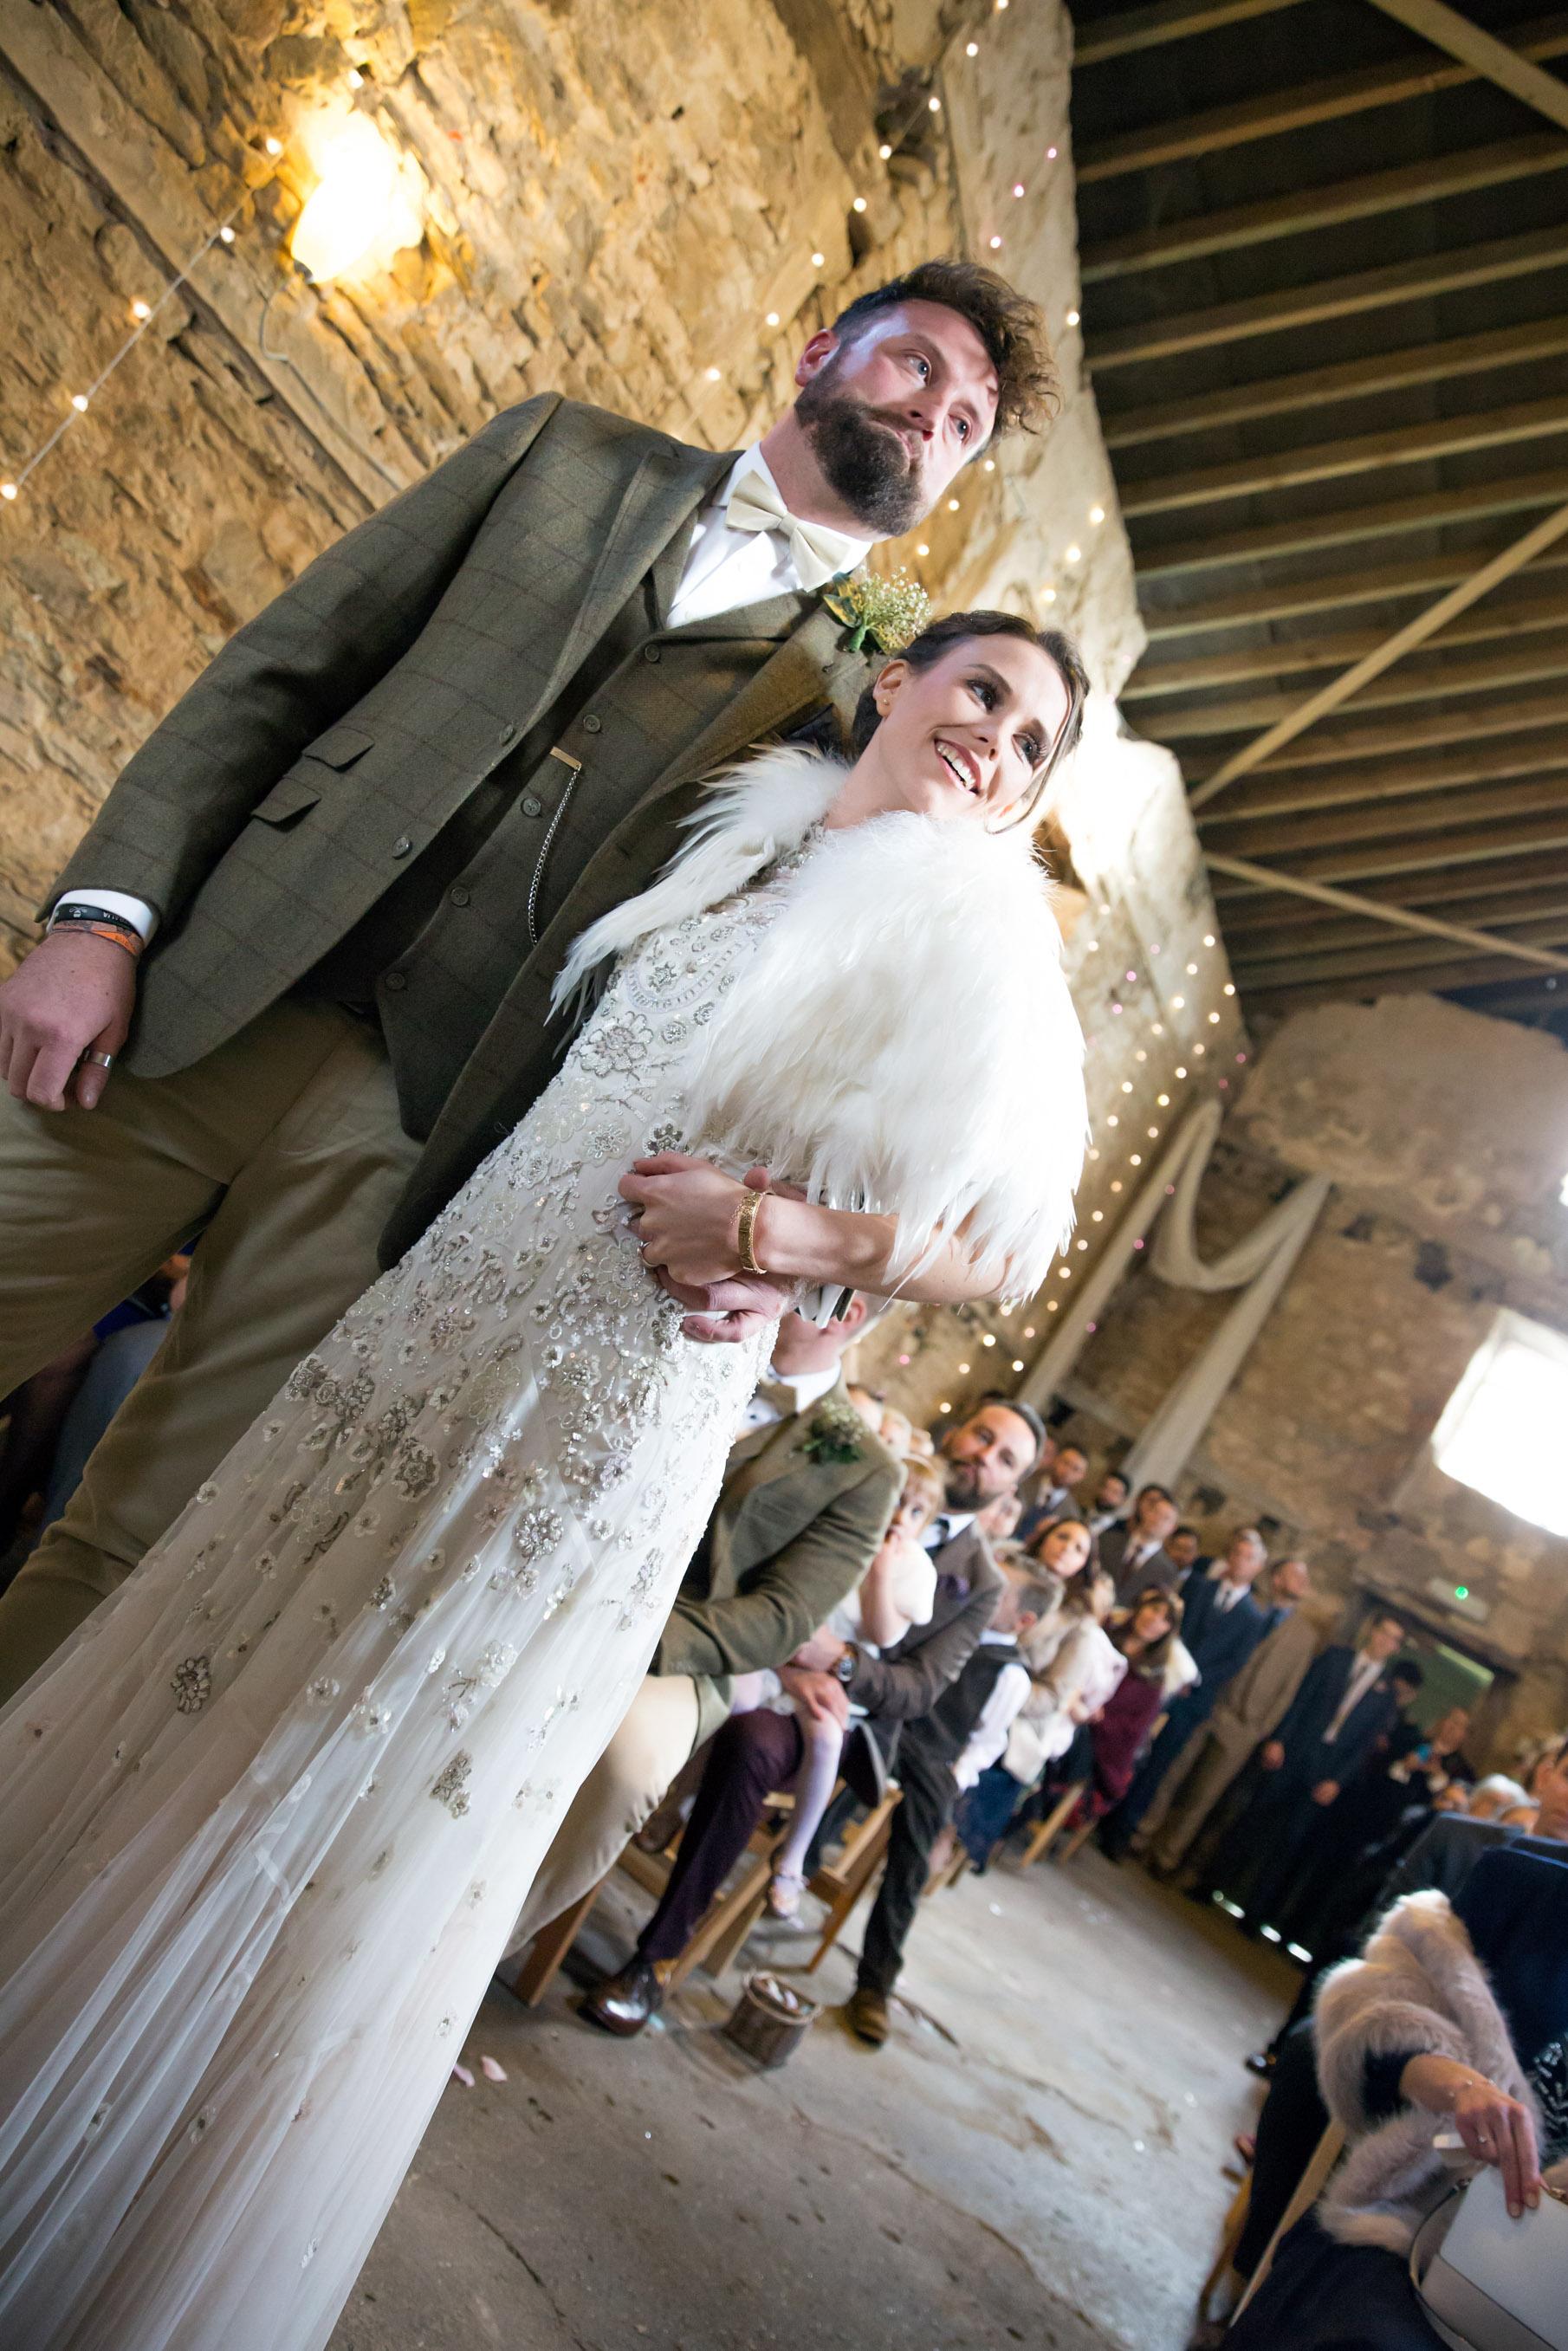 Jess & Ben - Bristol Wedding Photographer - Wright Wedding Photography - 66